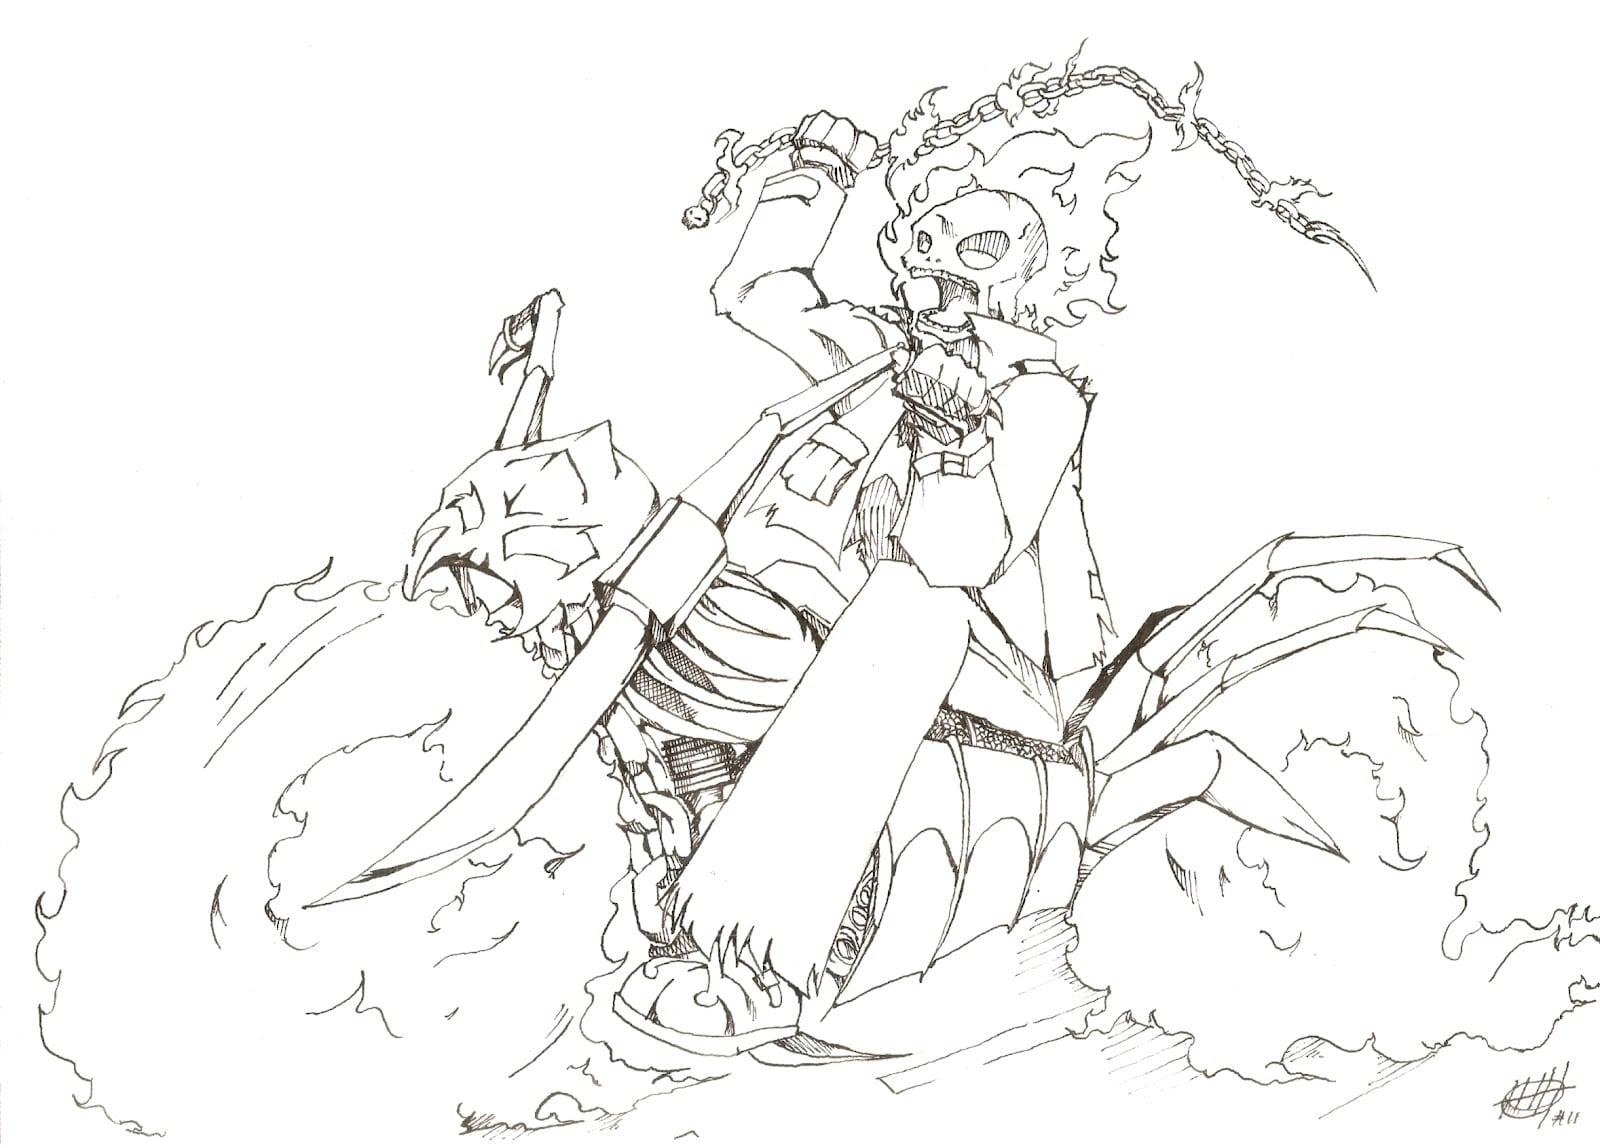 Motoqueiro Fantasma Para Colorir Desenhos Sketch Coloring Page